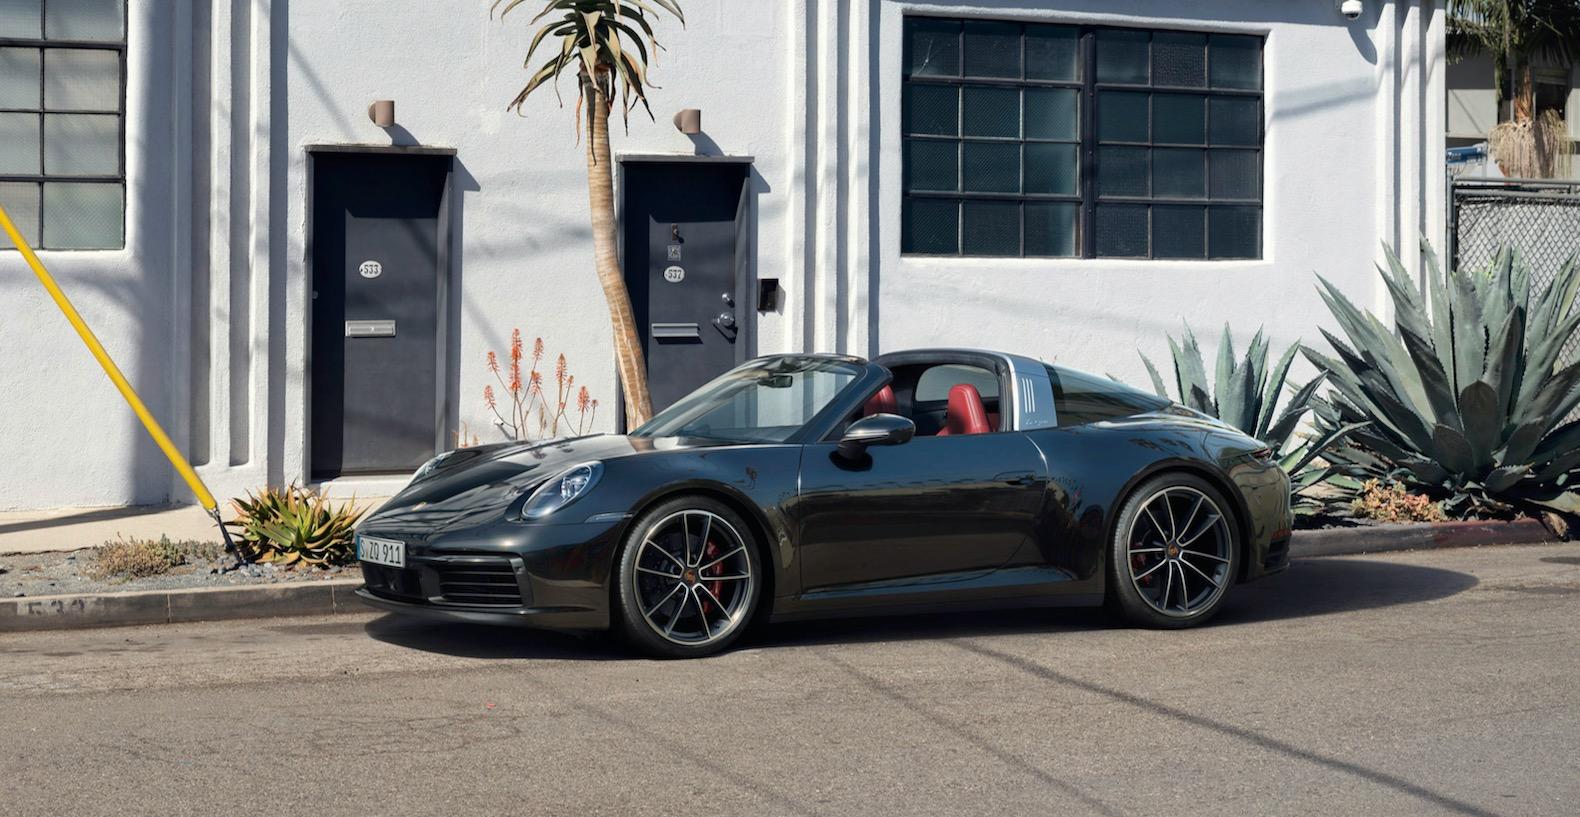 2021 Porsche 911 Targa 4 And 4s Models Debut The Torque Report